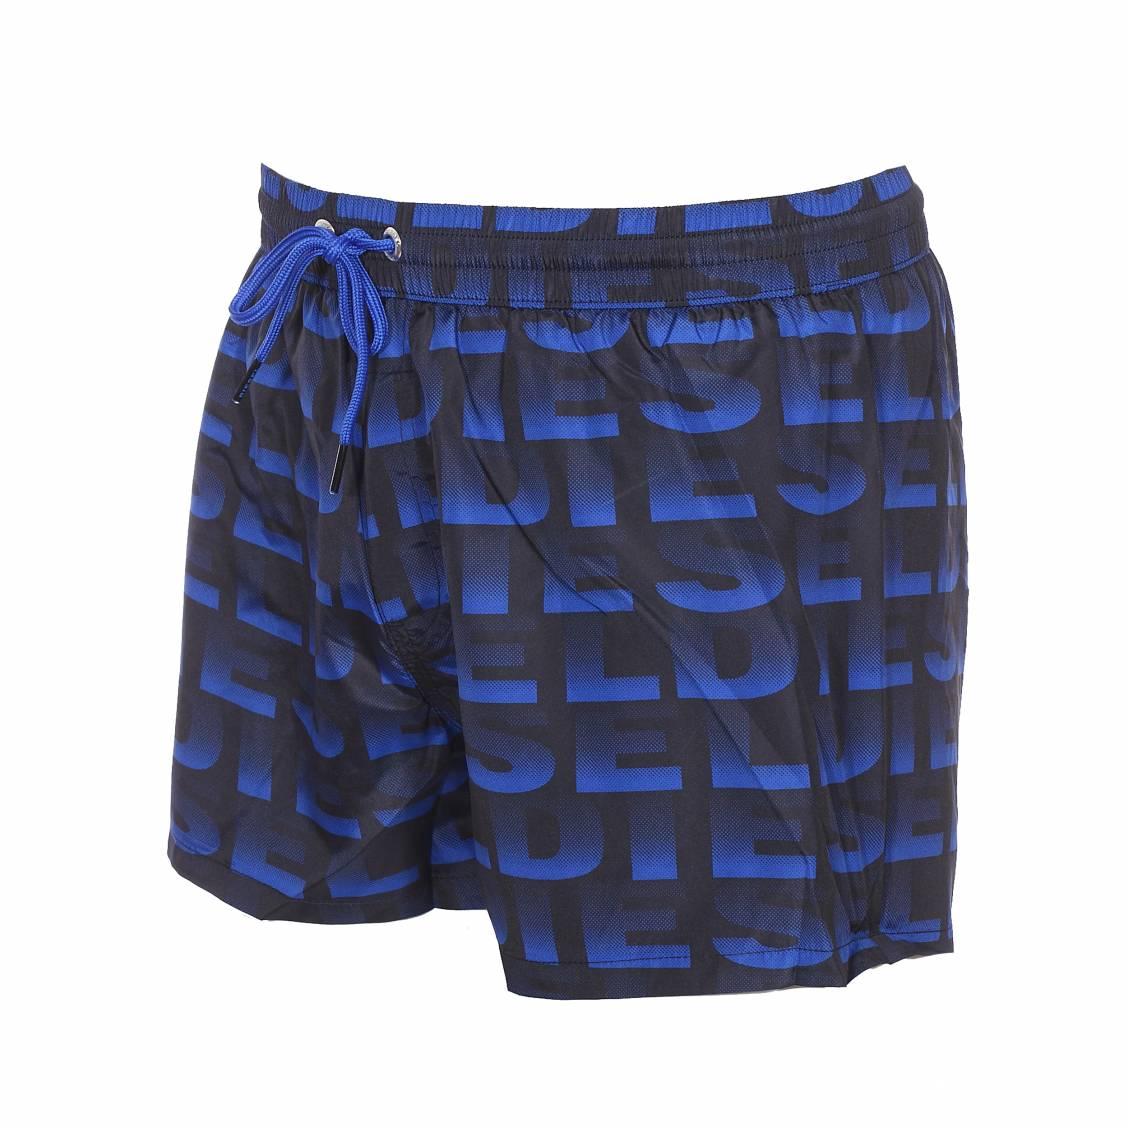 Short de bain diesel bmbx sandy bleu marine monogramm for Bain de soleil marina bleu